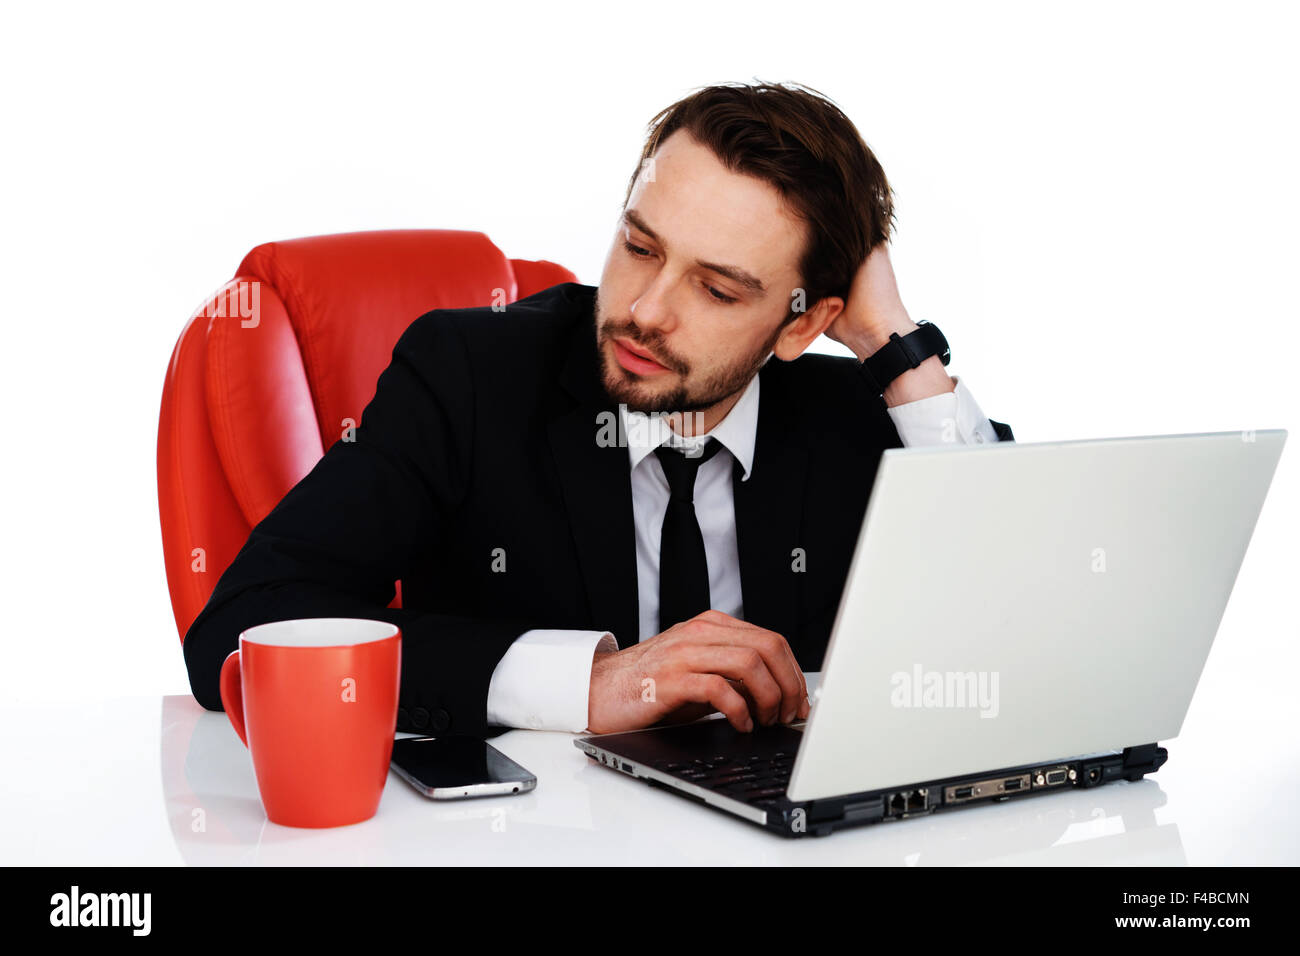 Hardworking businessman pausing to think - Stock Image